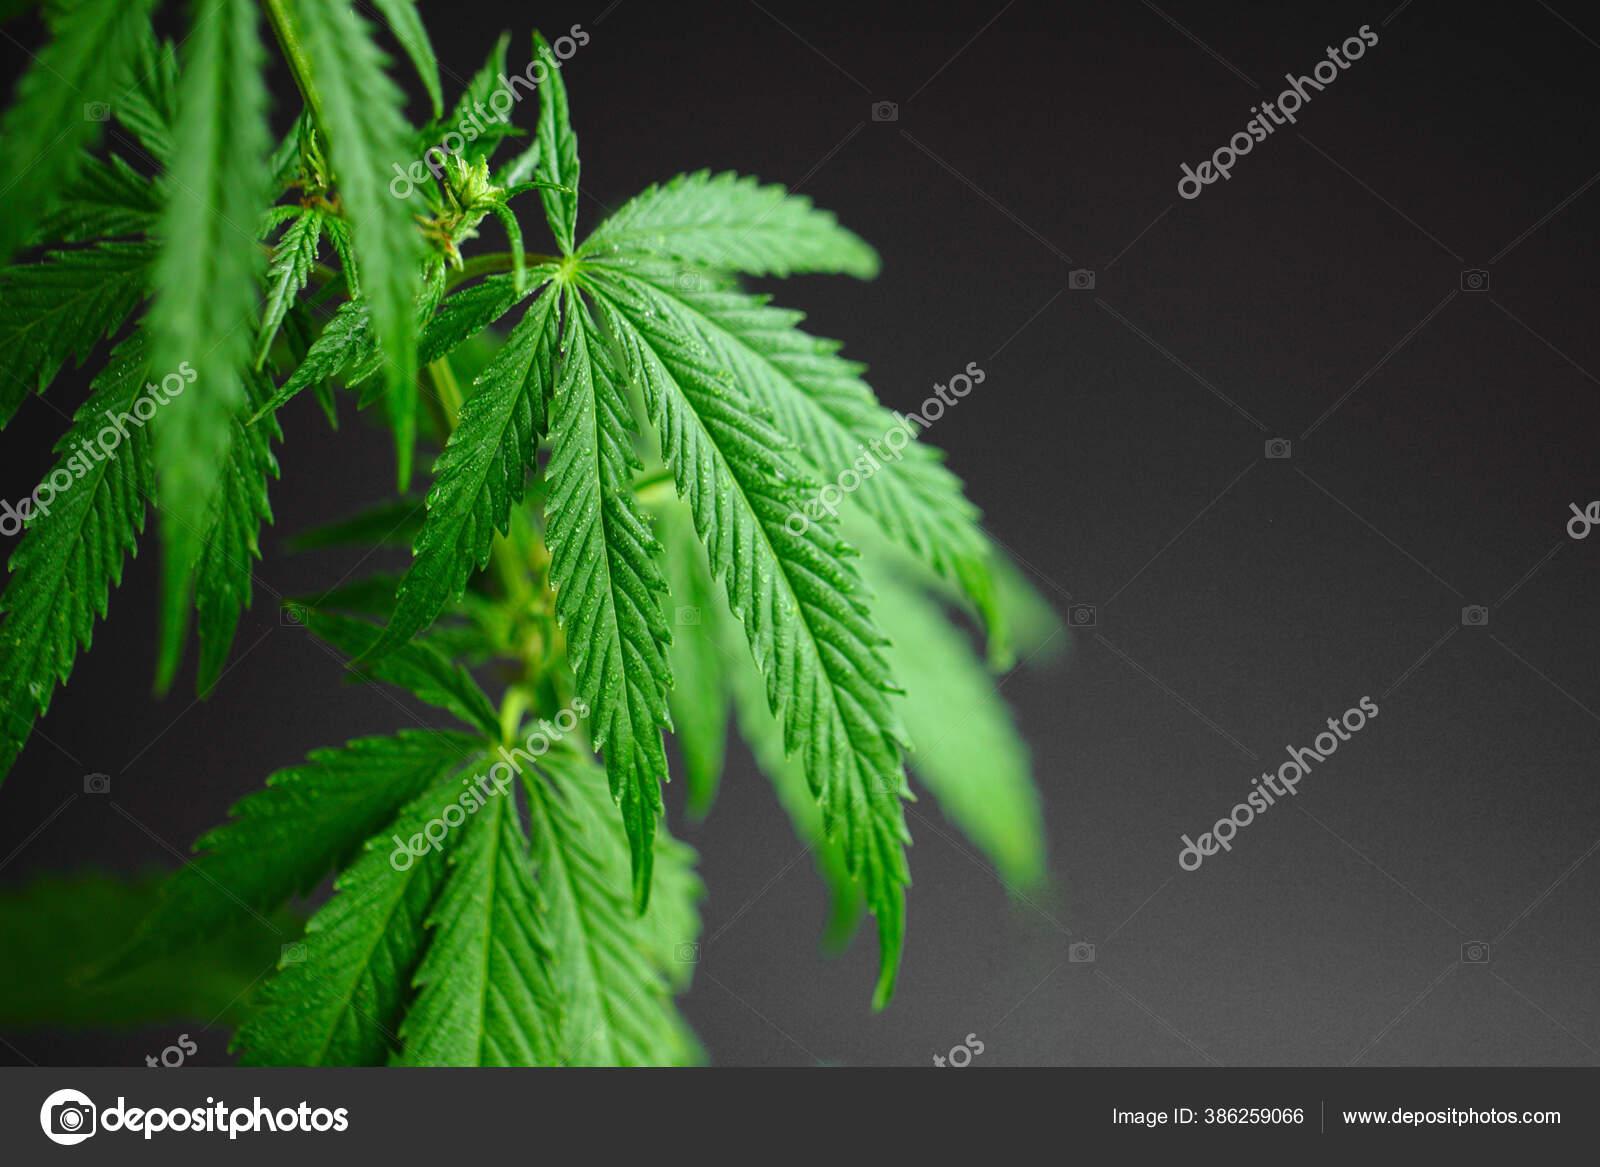 depositphotos 386259066 stock photo marijuana leaves cannabis black background